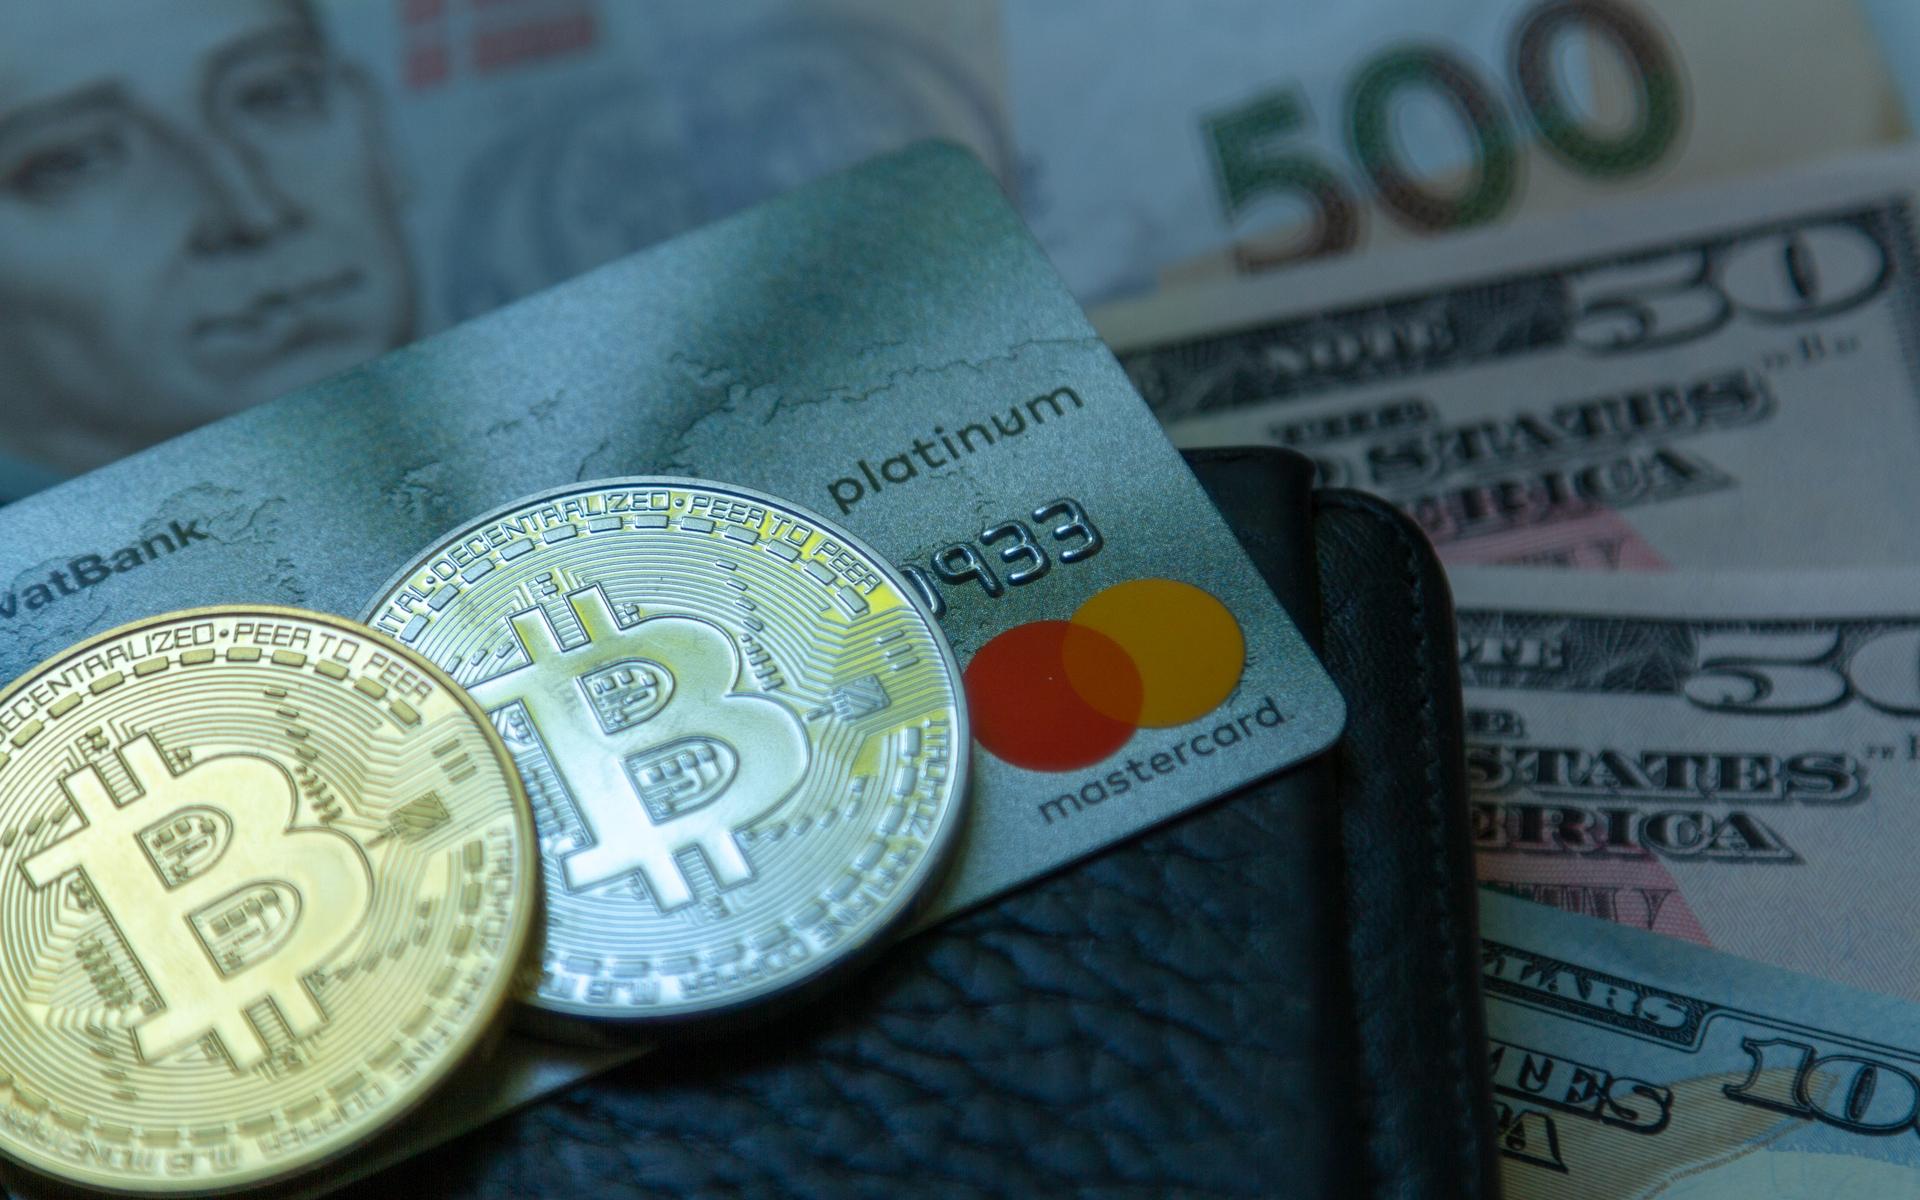 visa mastercard bitcoin